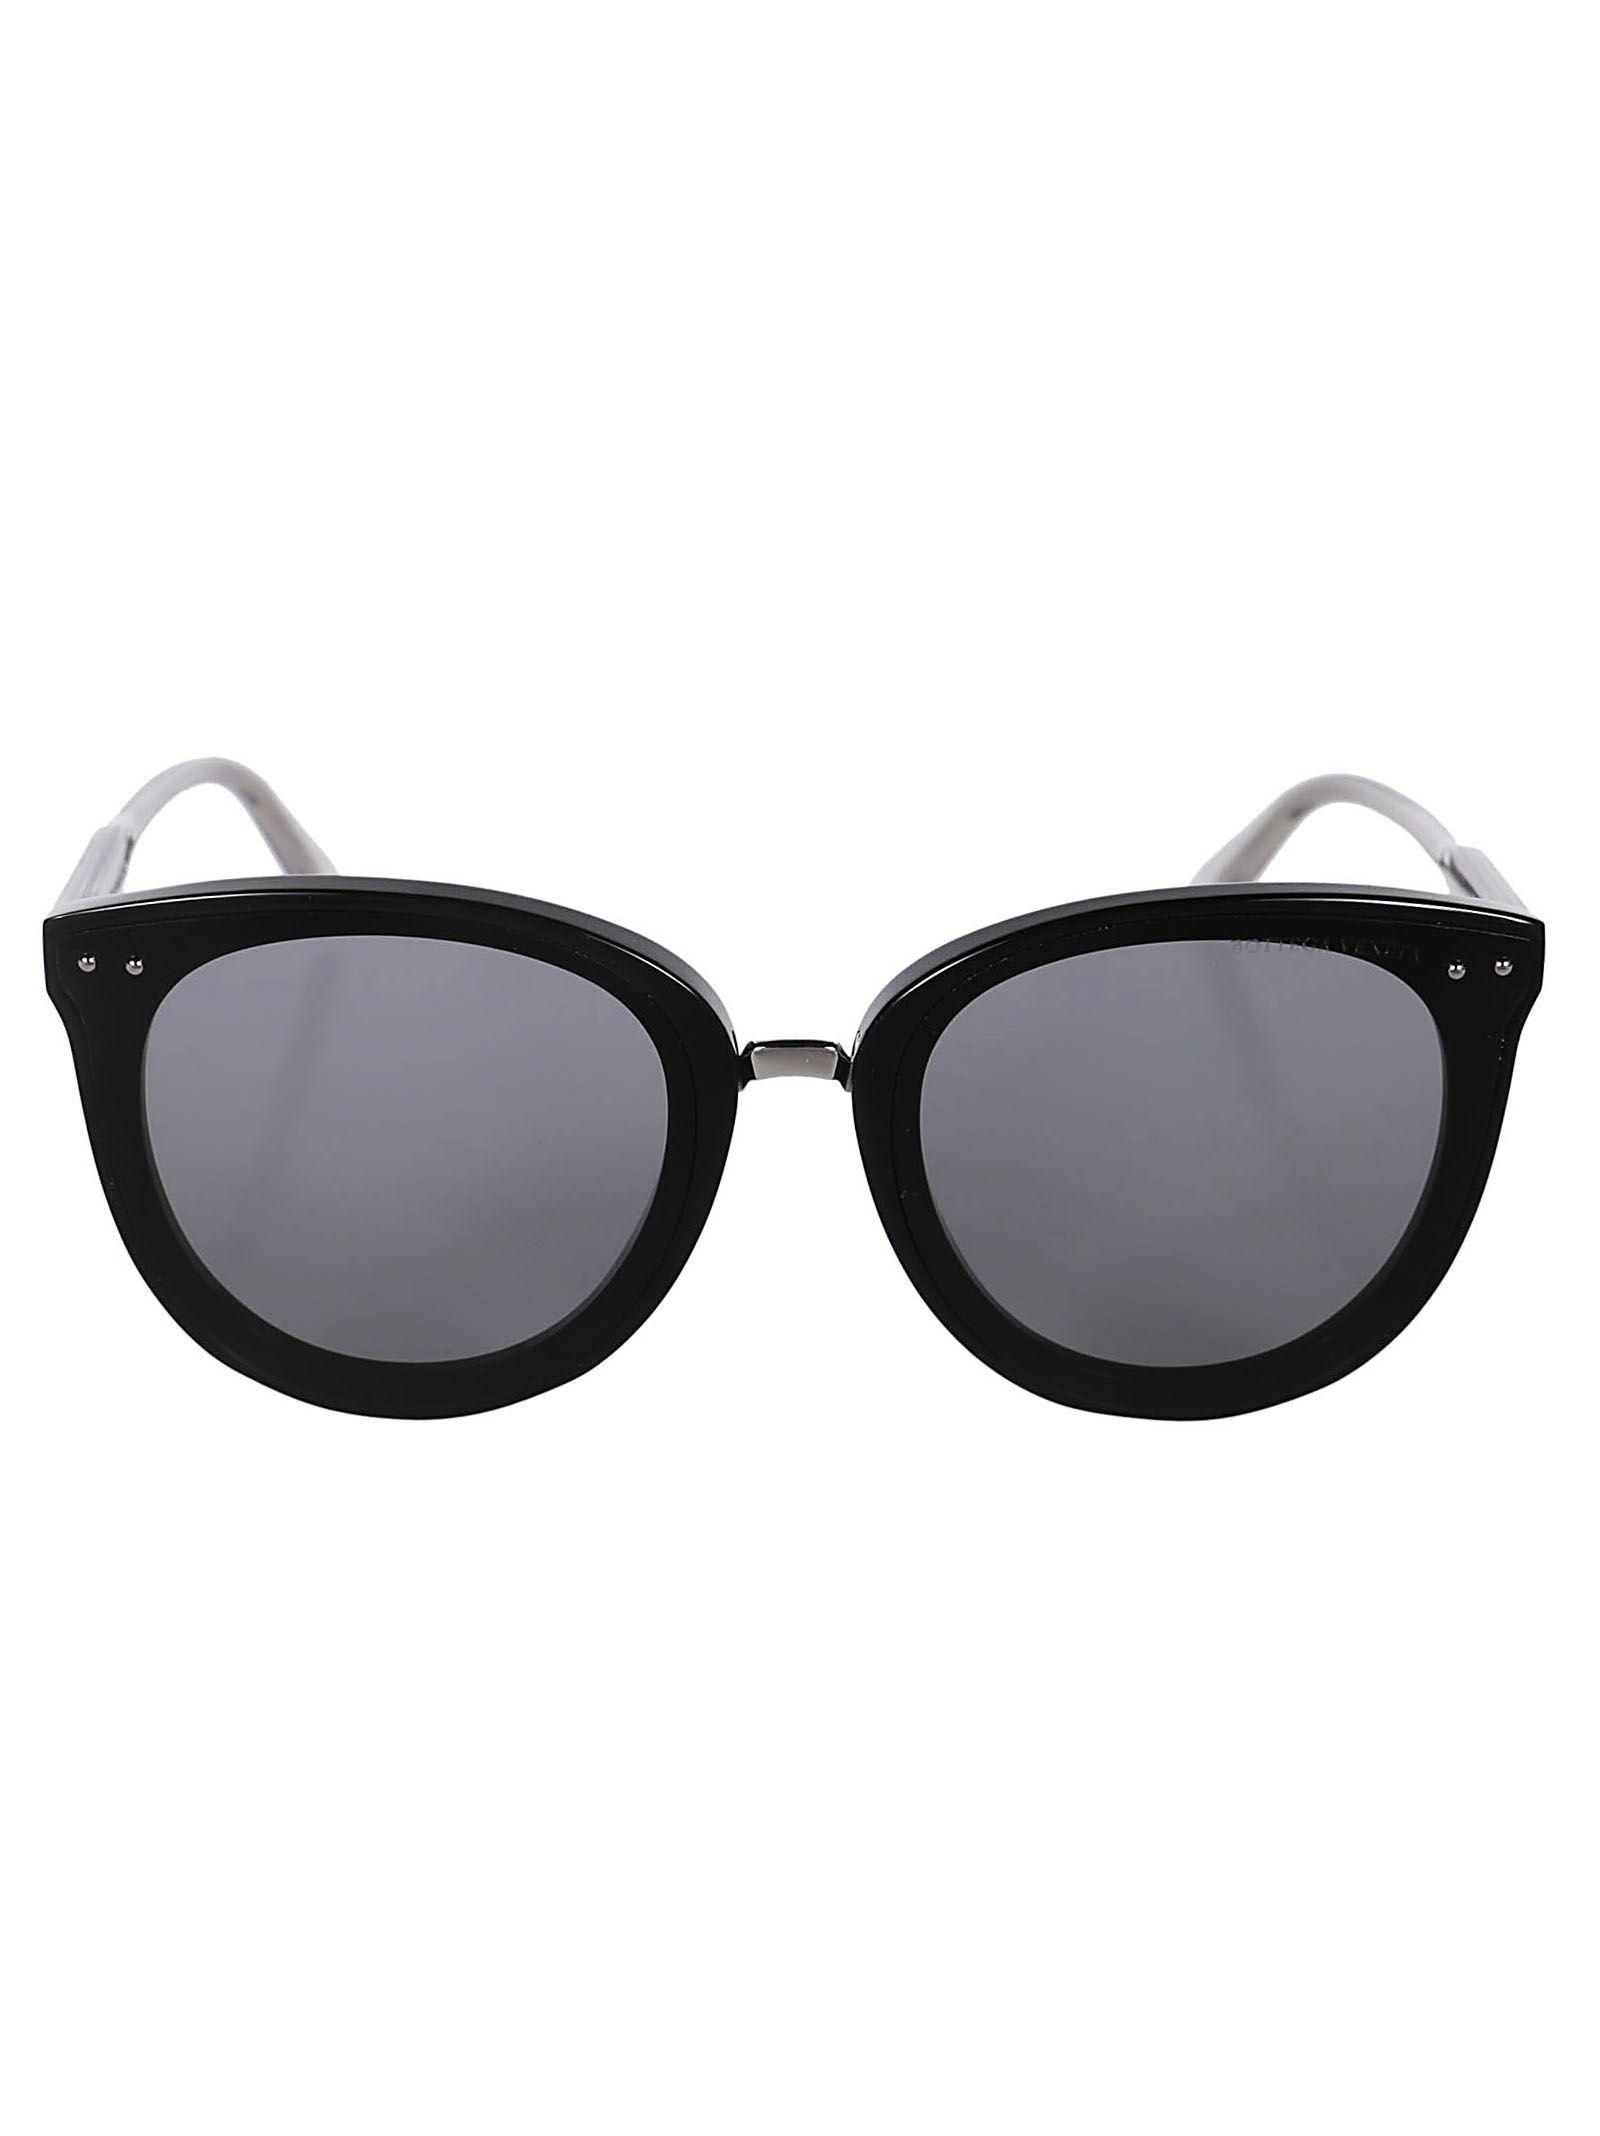 3b15dbd8d6d Bottega Veneta Round Shape Sunglasses In Black